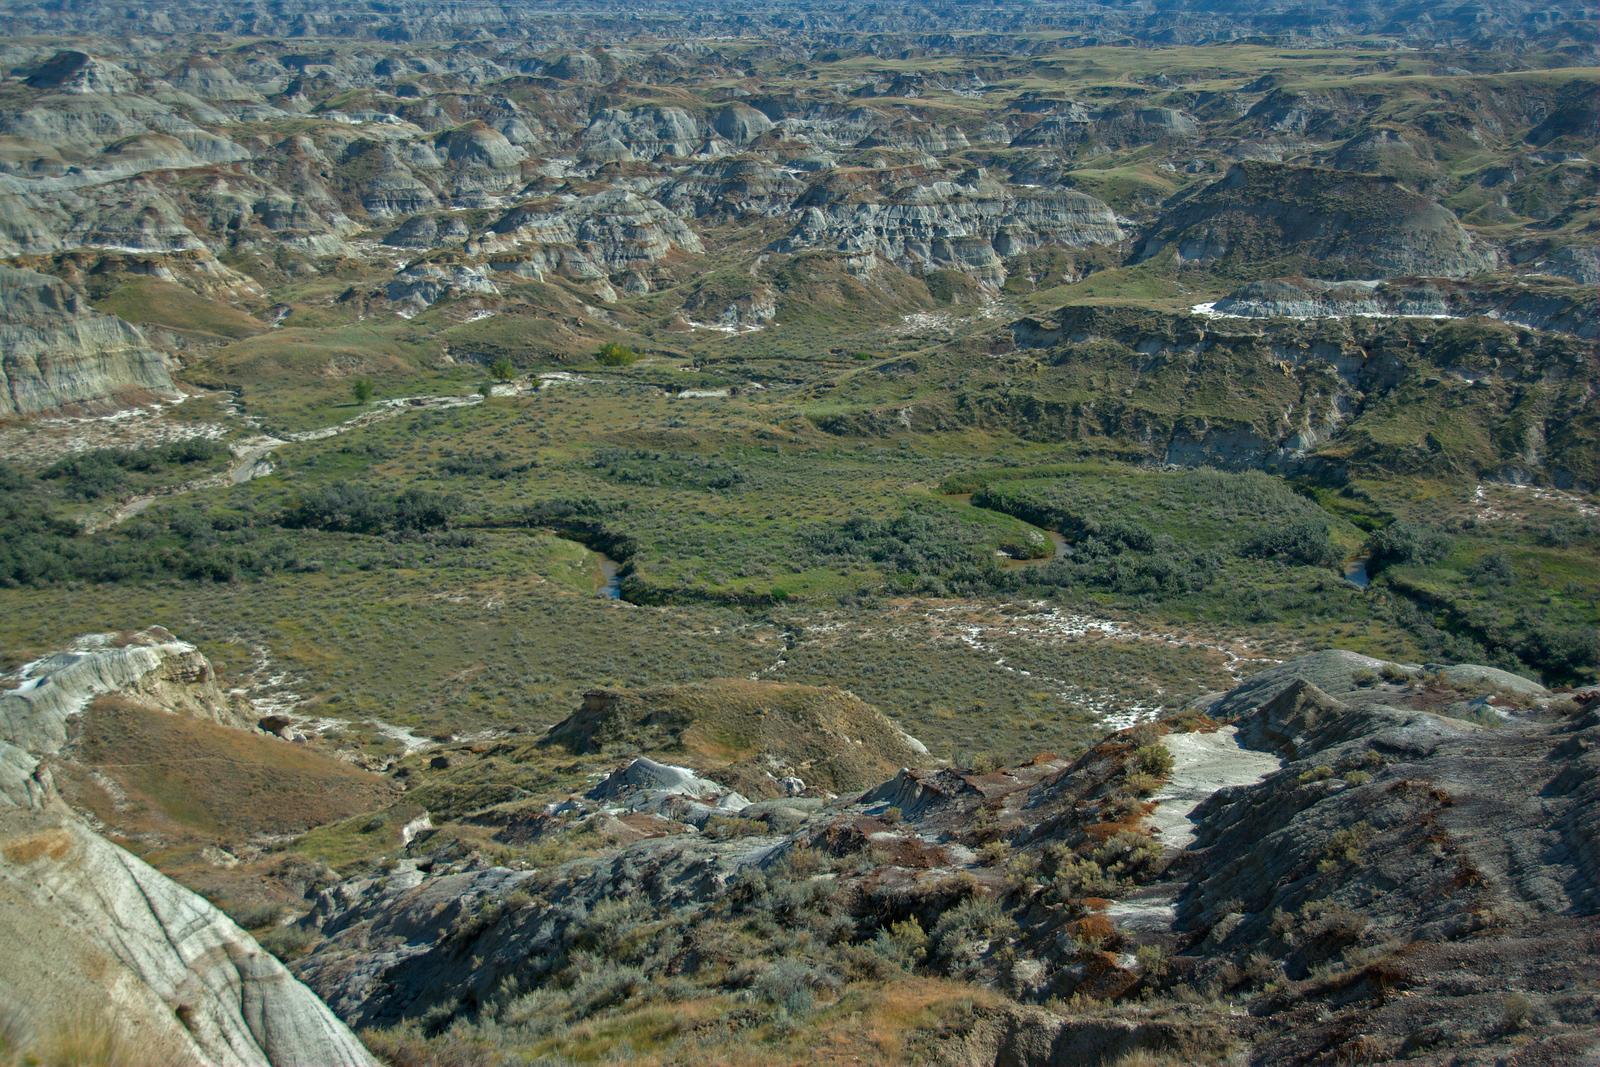 Dinosaur Provincial Park UNESCO World Heritage Site, Canada